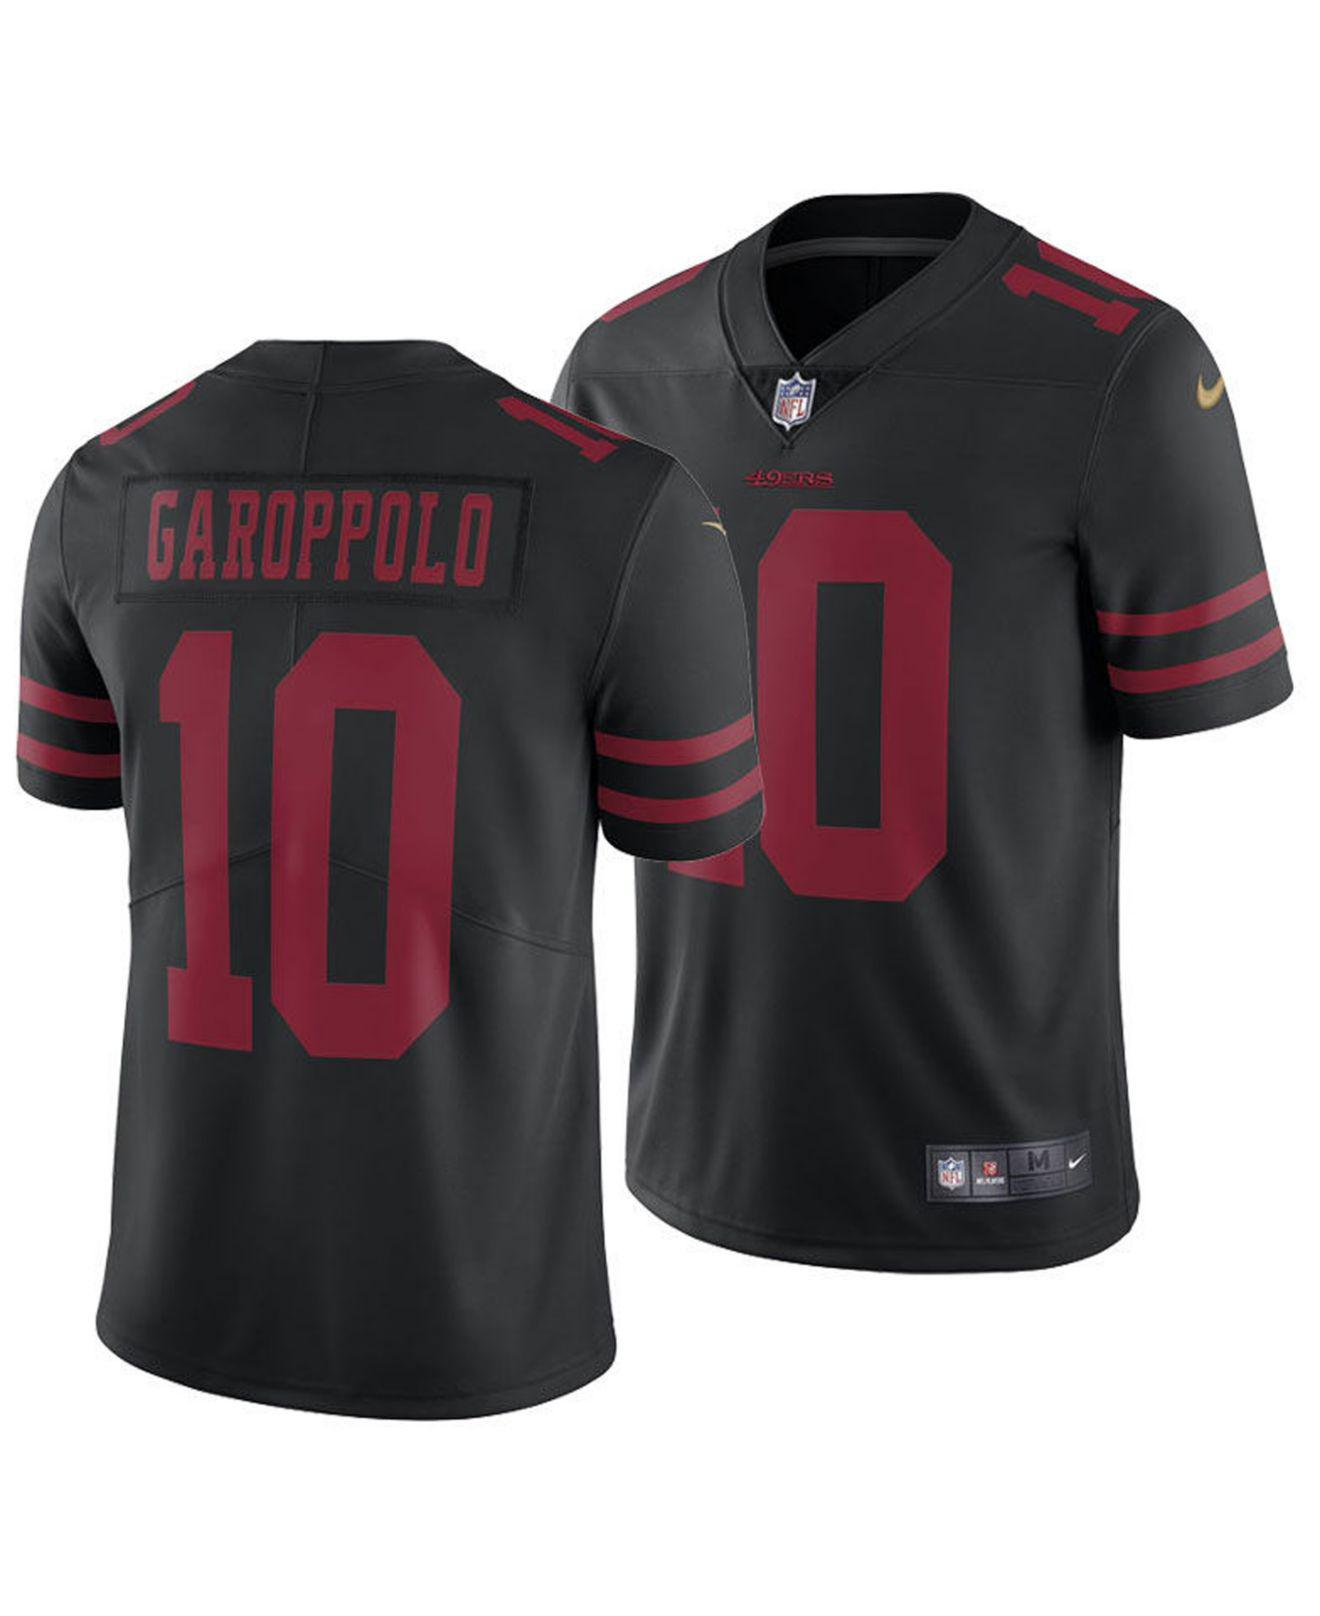 buy popular ccdb7 f17a0 Men's Black Jimmy Garoppolo San Francisco 49ers Vapor Untouchable Limited  Jersey